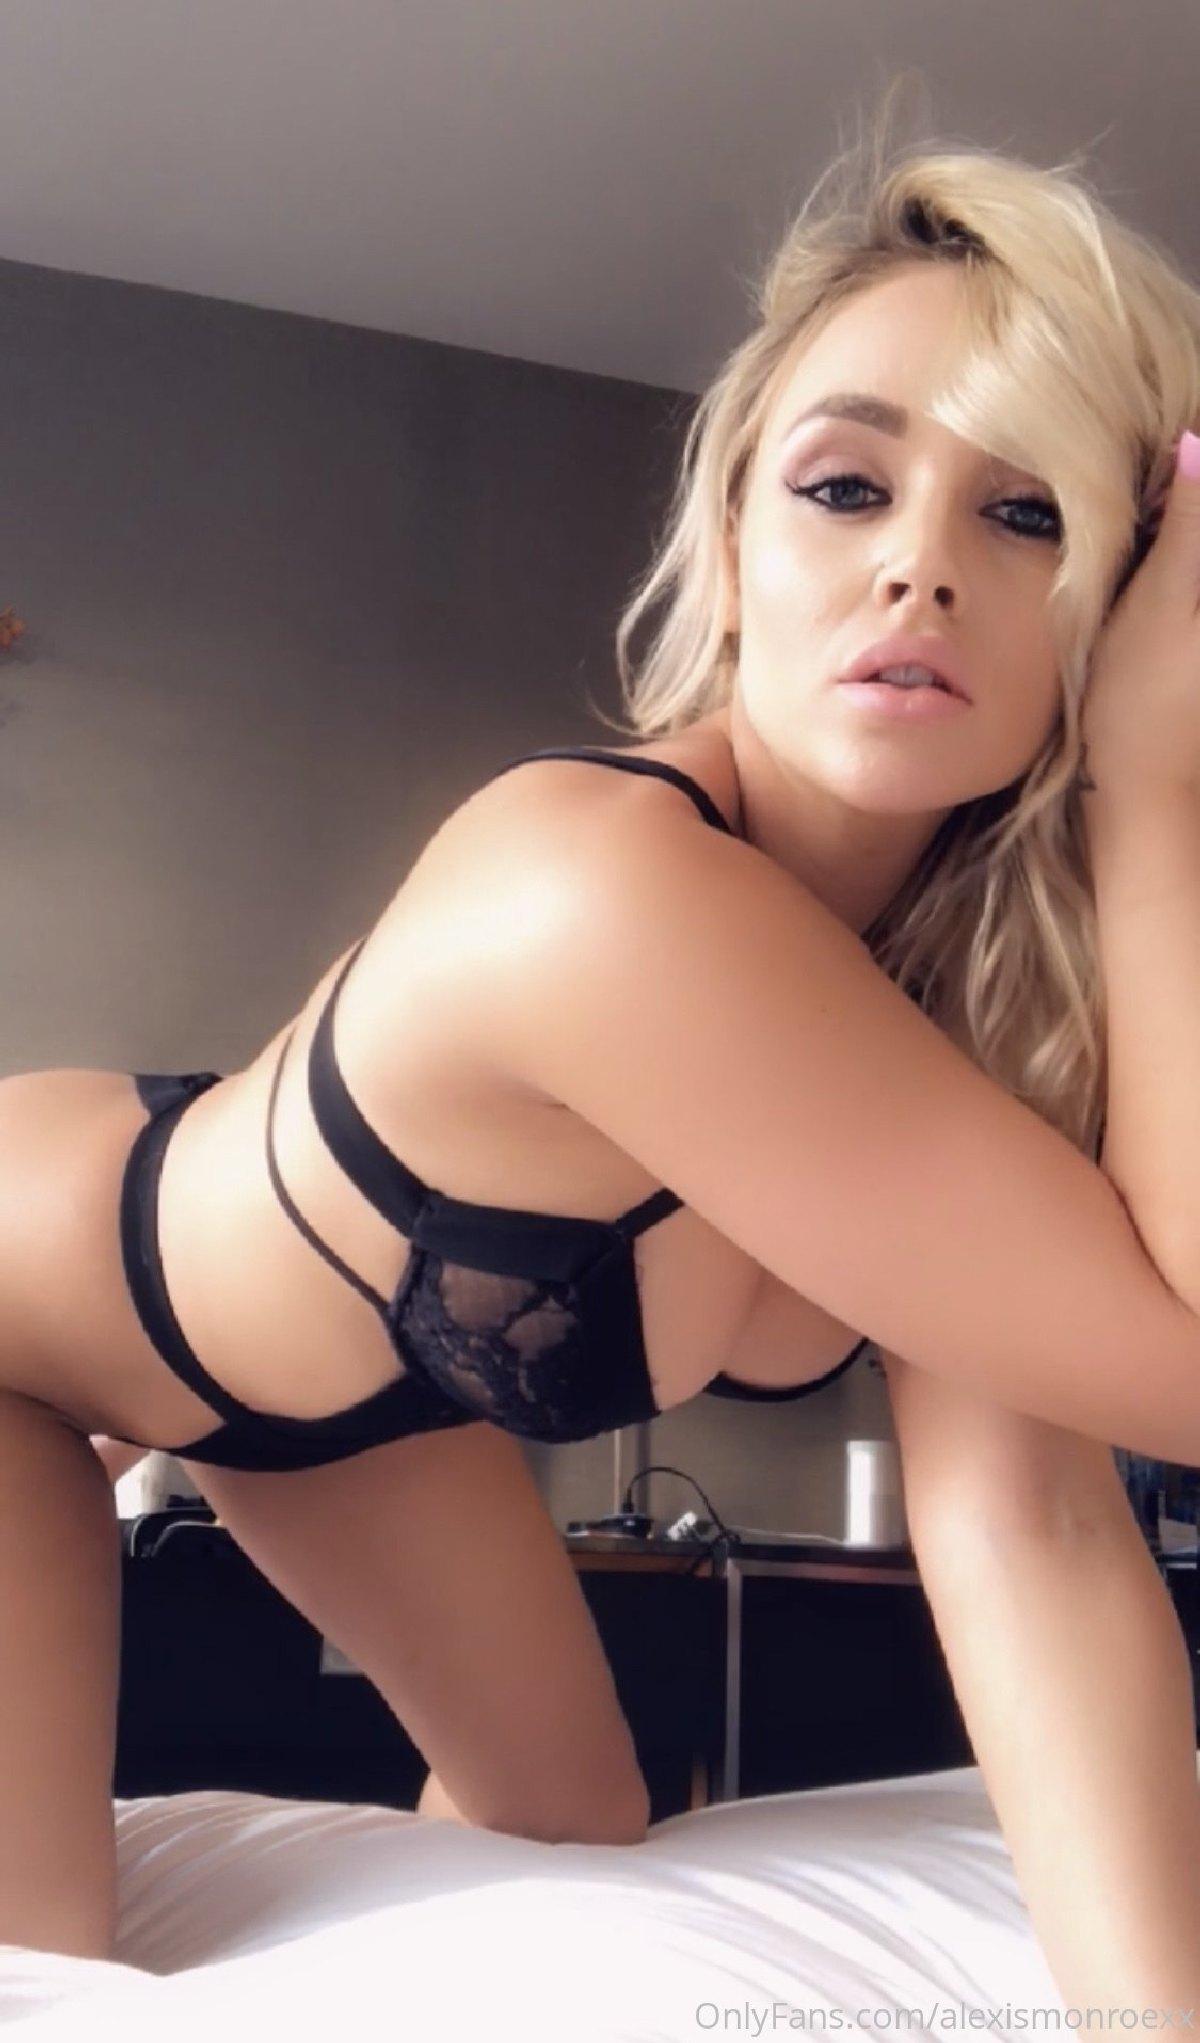 Lexi Monroe Onlyfans 0032